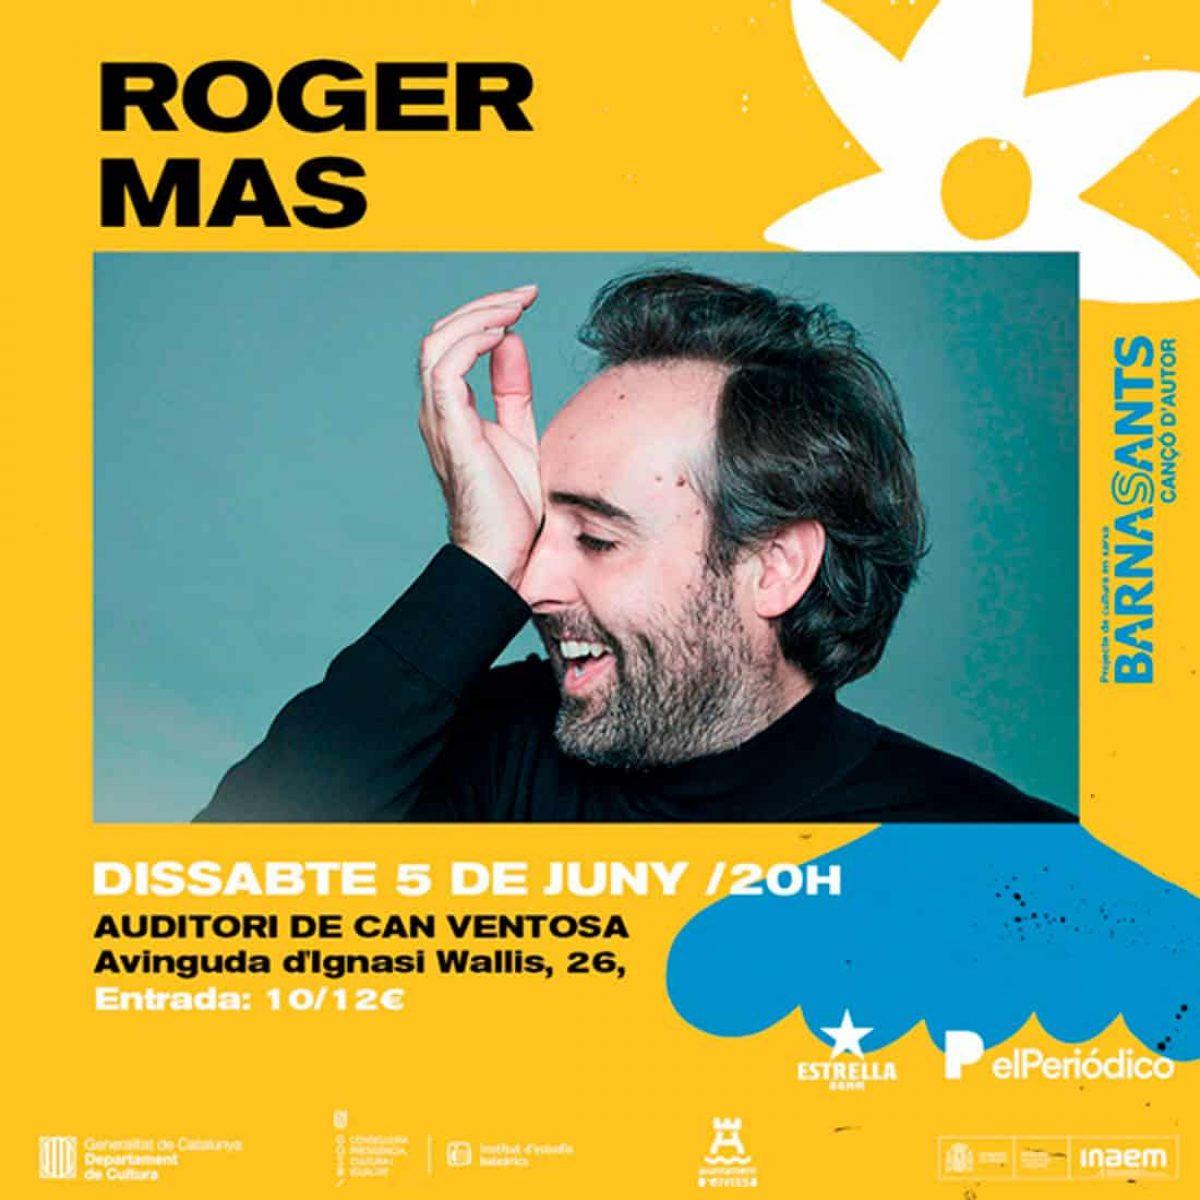 concierto-roger-mas-ibiza-2021-welcometoibiza